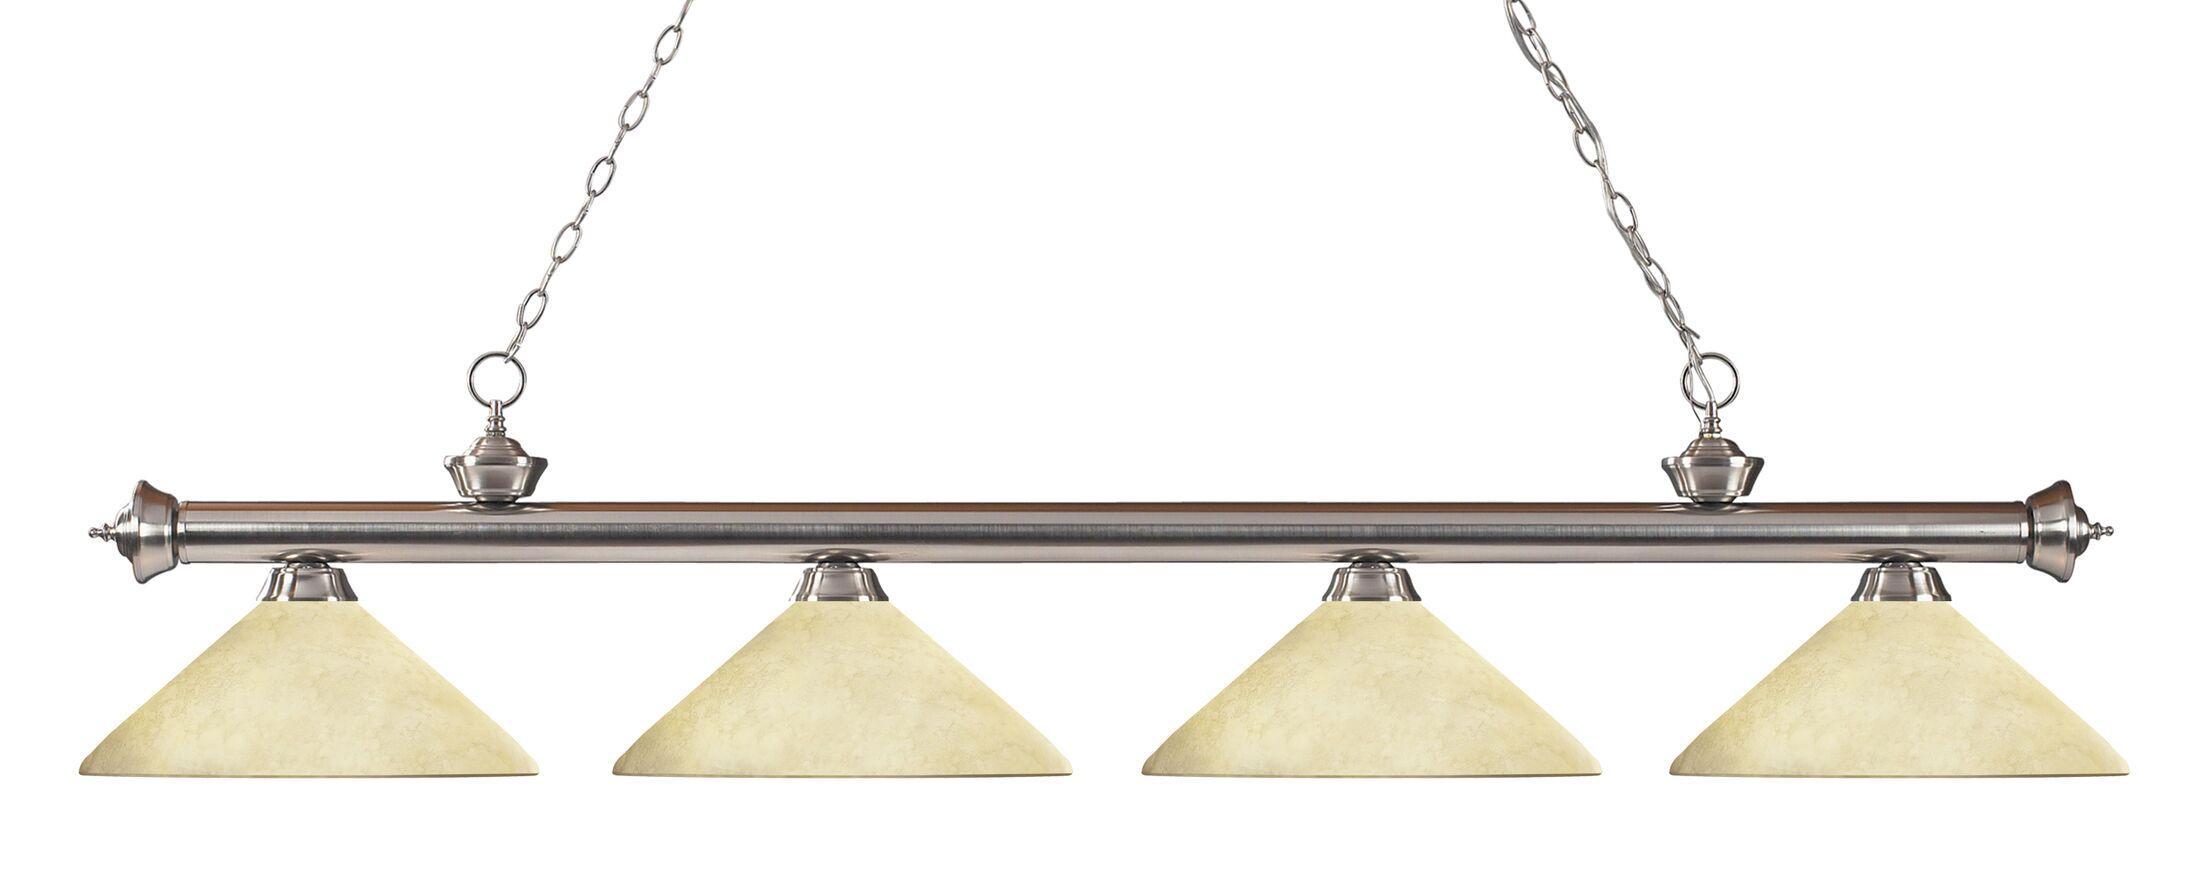 Zephyr 4-Light Cone Shade Kitchen Island Pendant Shade Color: Golden Mottle, Finish: Brushed Nickel